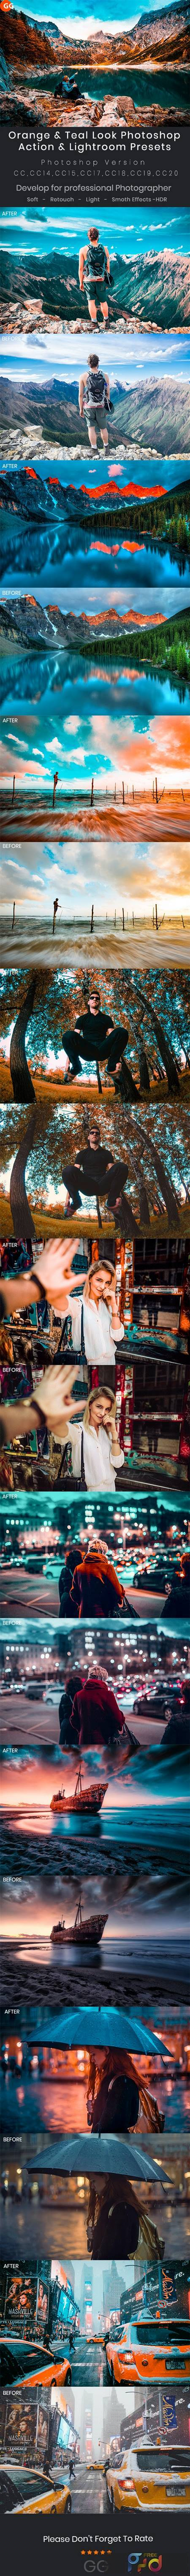 Orange & Teal Look Photoshop Action & Lightroom Presets 28205906 1